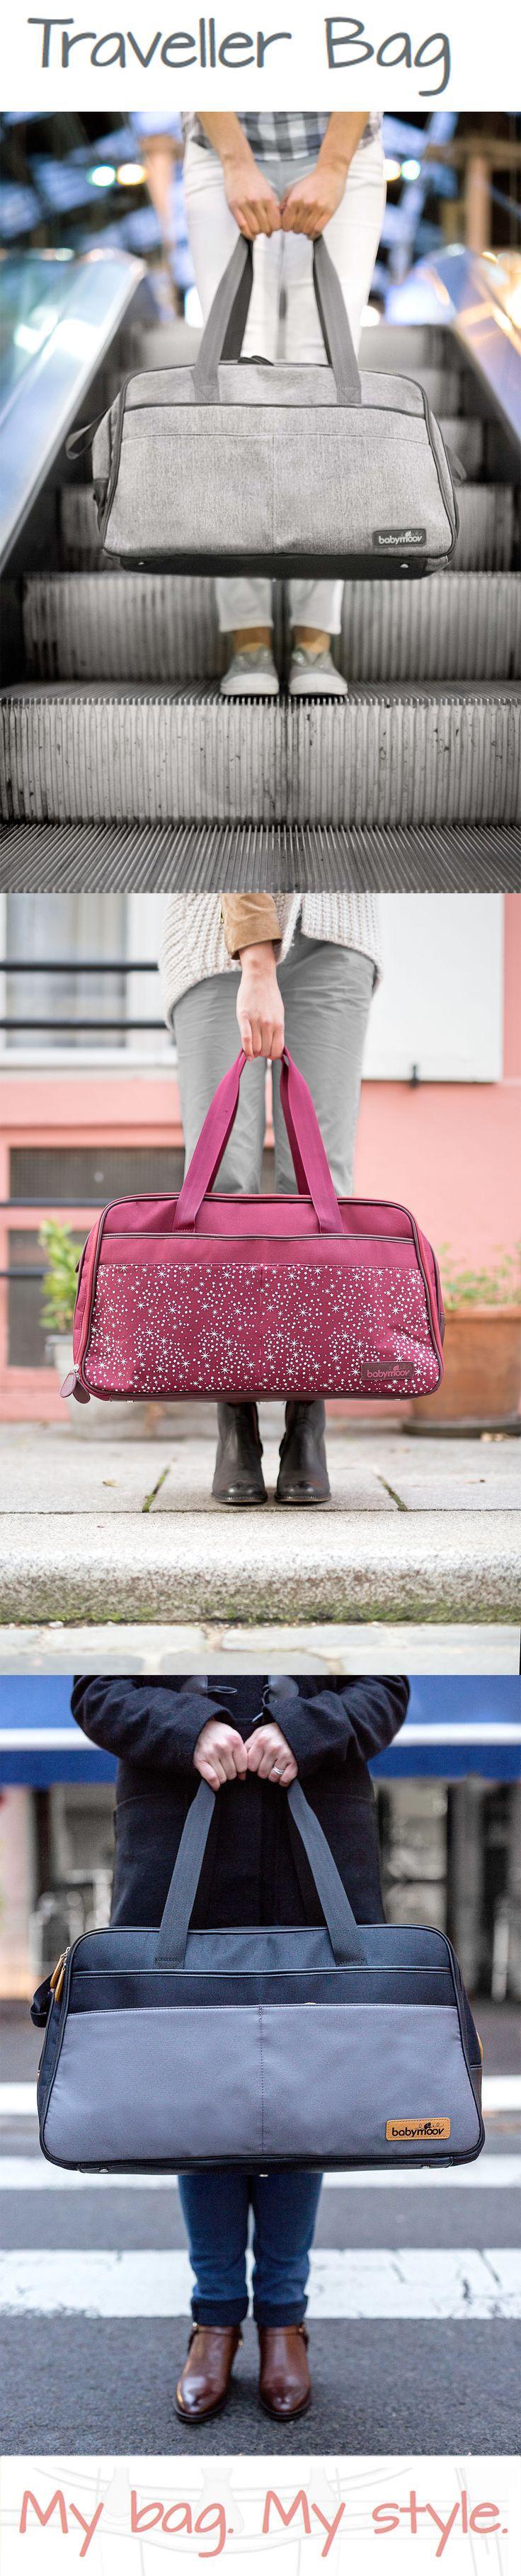 Traveller Bag #XXL #Organized #48H #Maternity #Babymoov #MyBagMyStyle #diaperBag